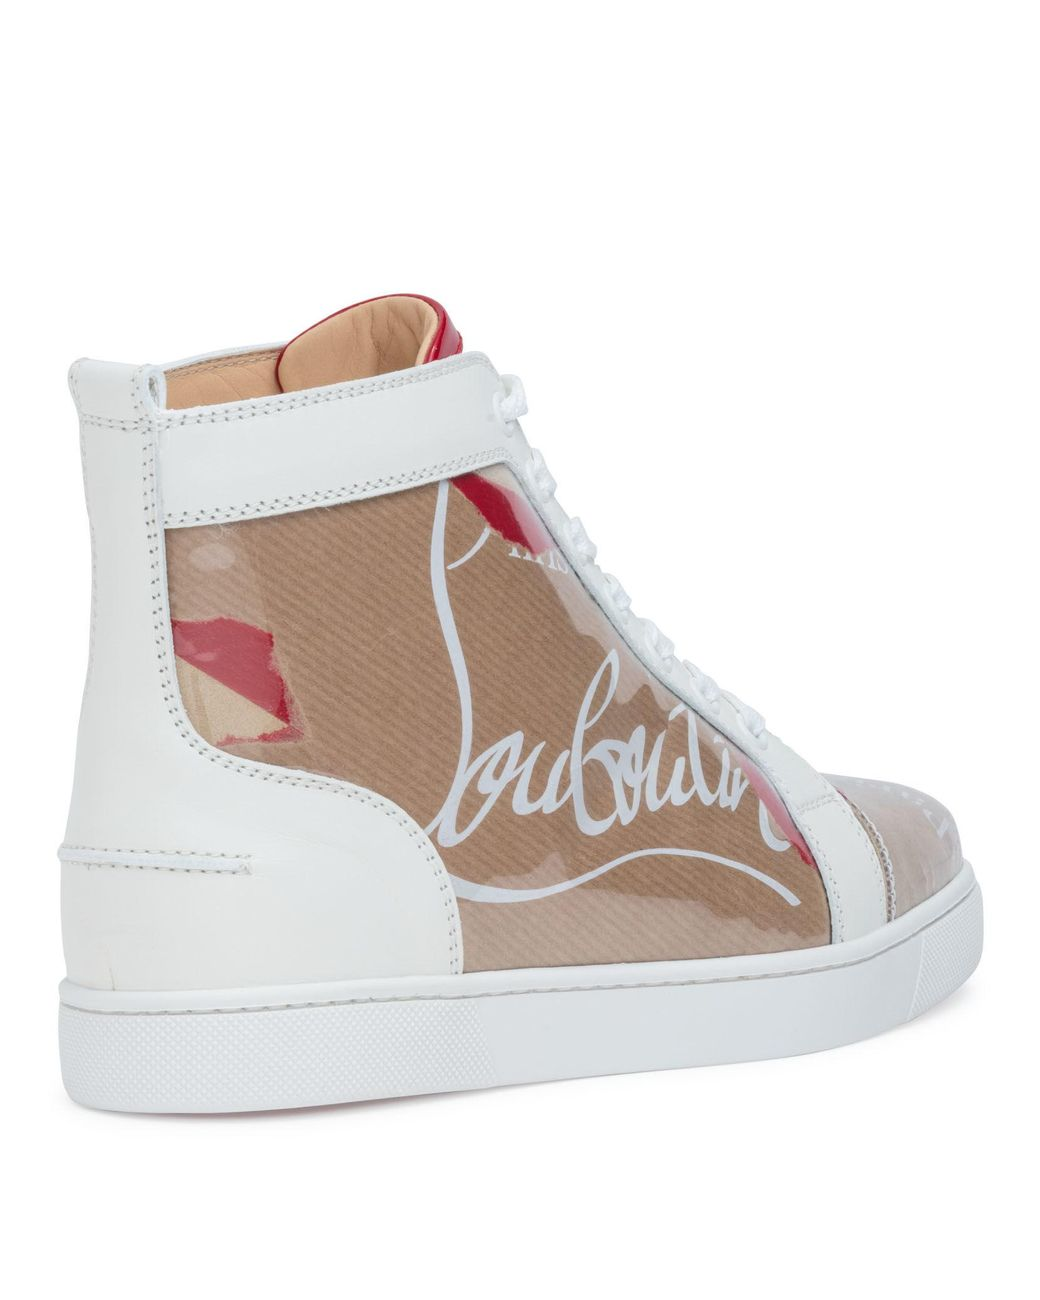 8d05fb91386 Women's Louis Loubi Kraft Pvc Sneakers